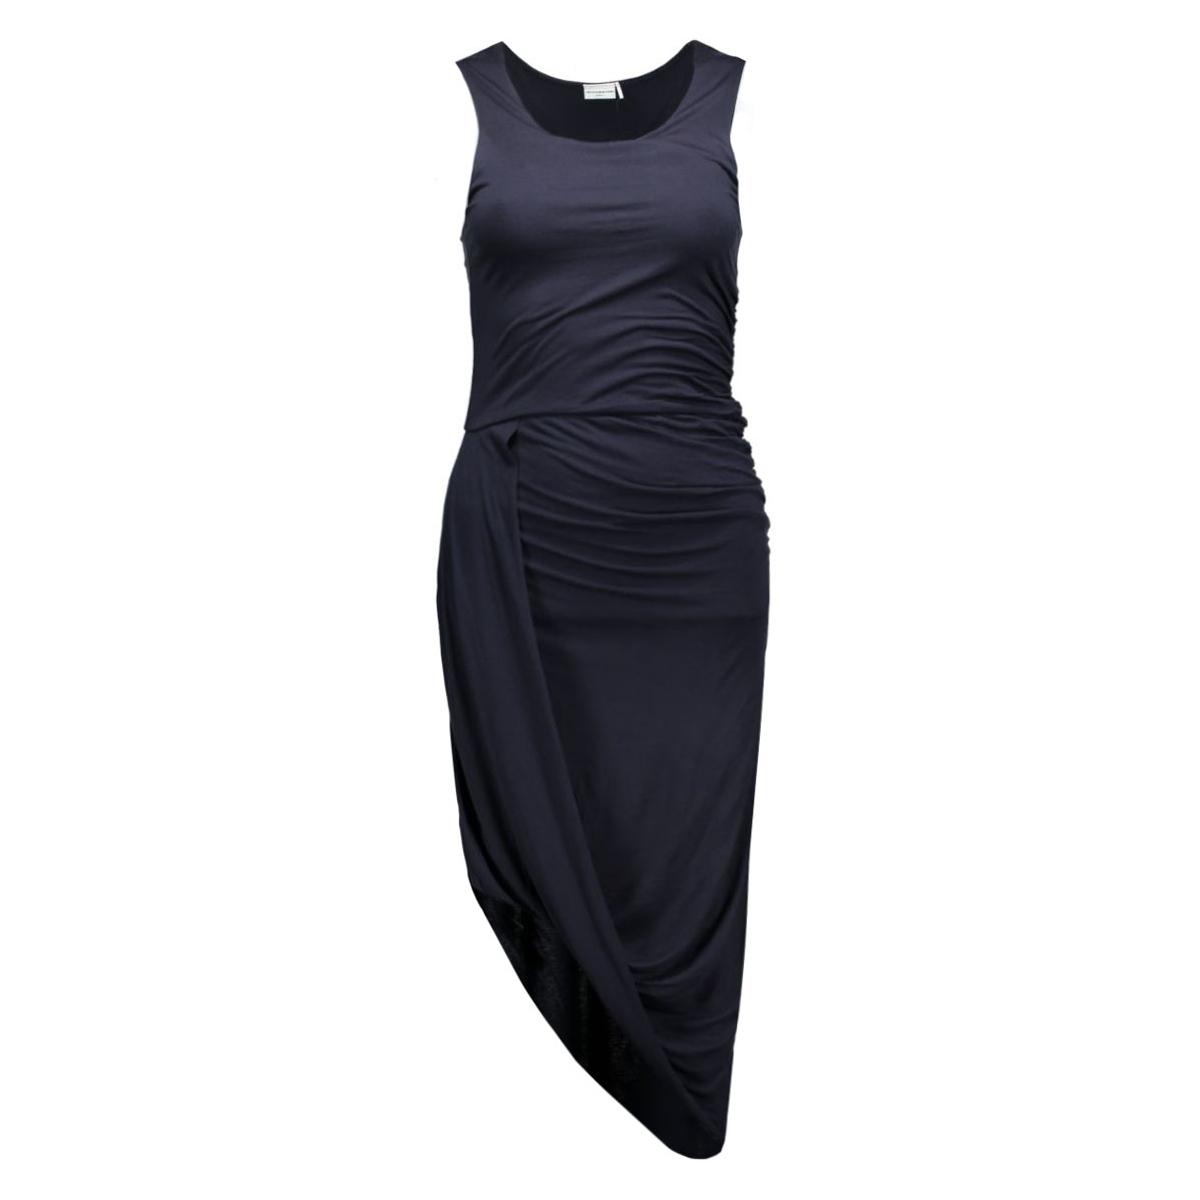 jdyice s/l dress icc jrs 15112800 jacqueline de yong jurk dark navy